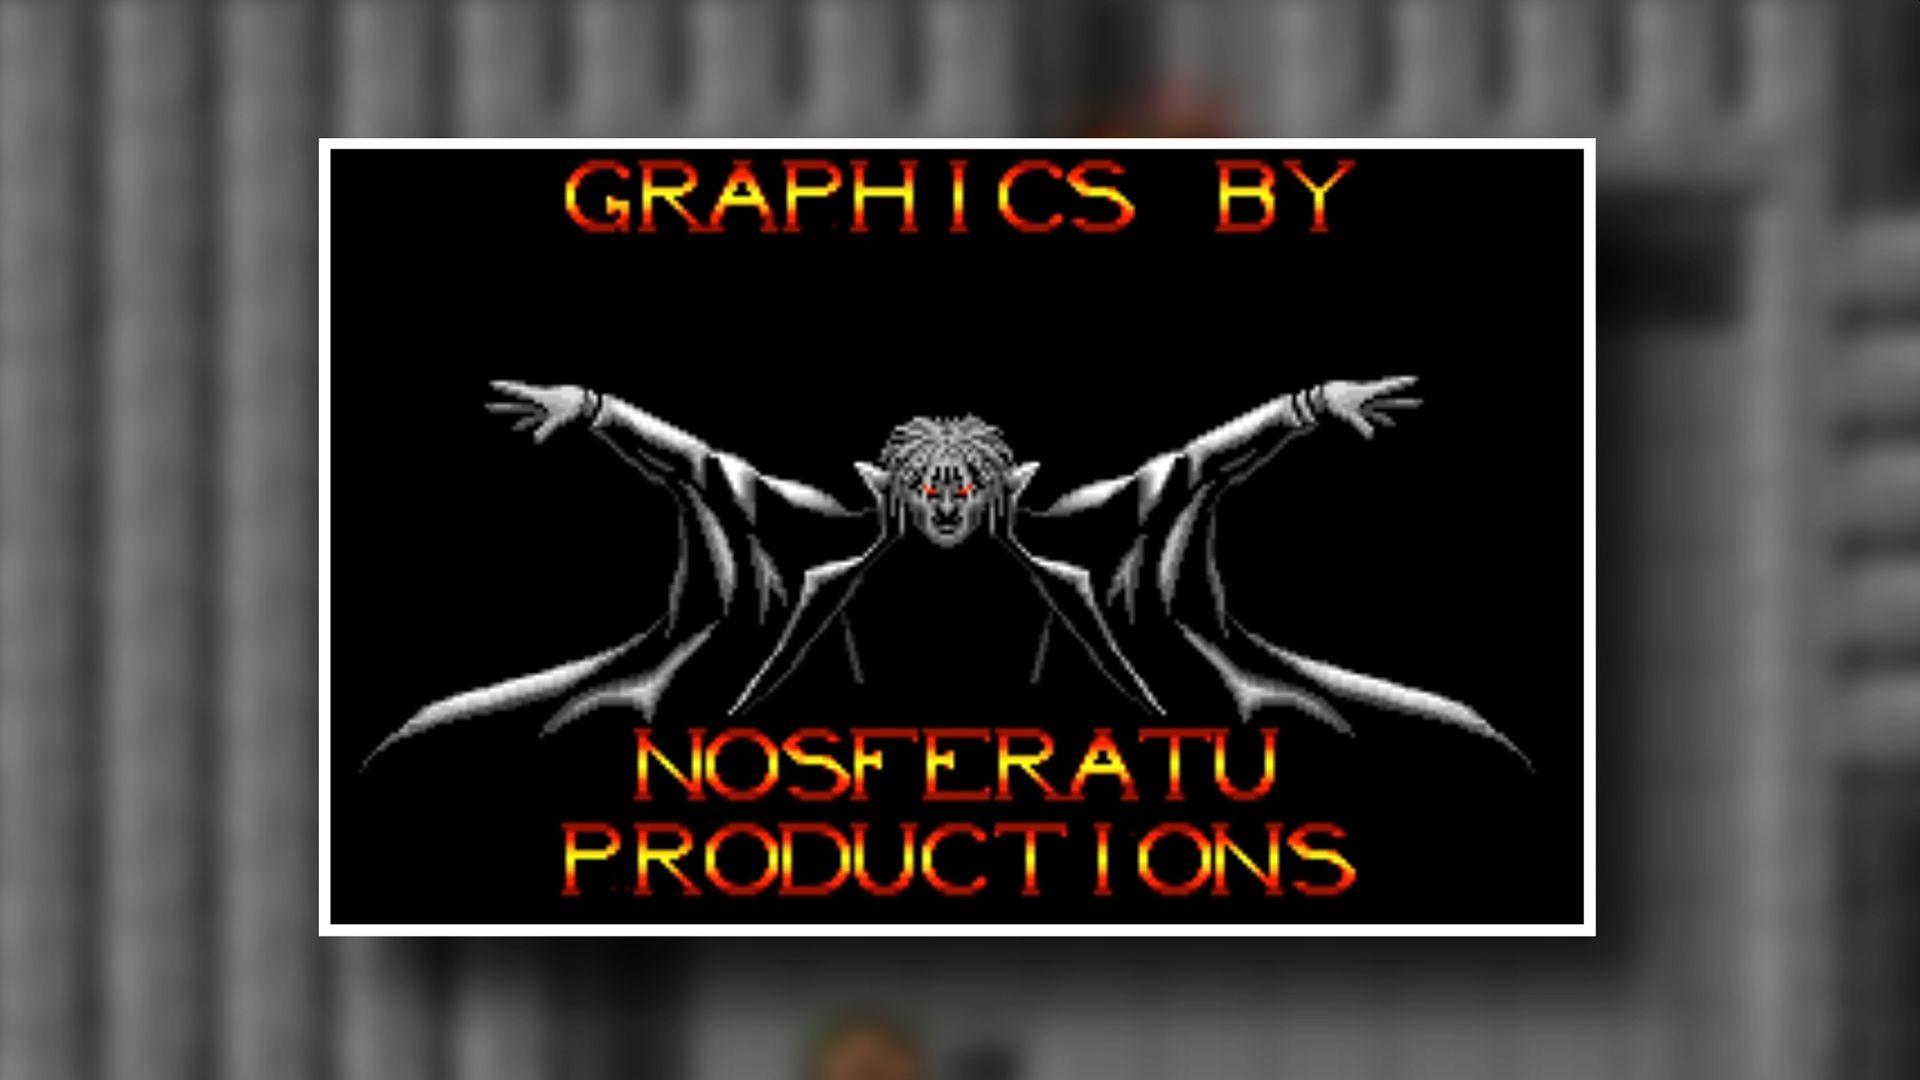 Nosferatu Productions was Robin's company.